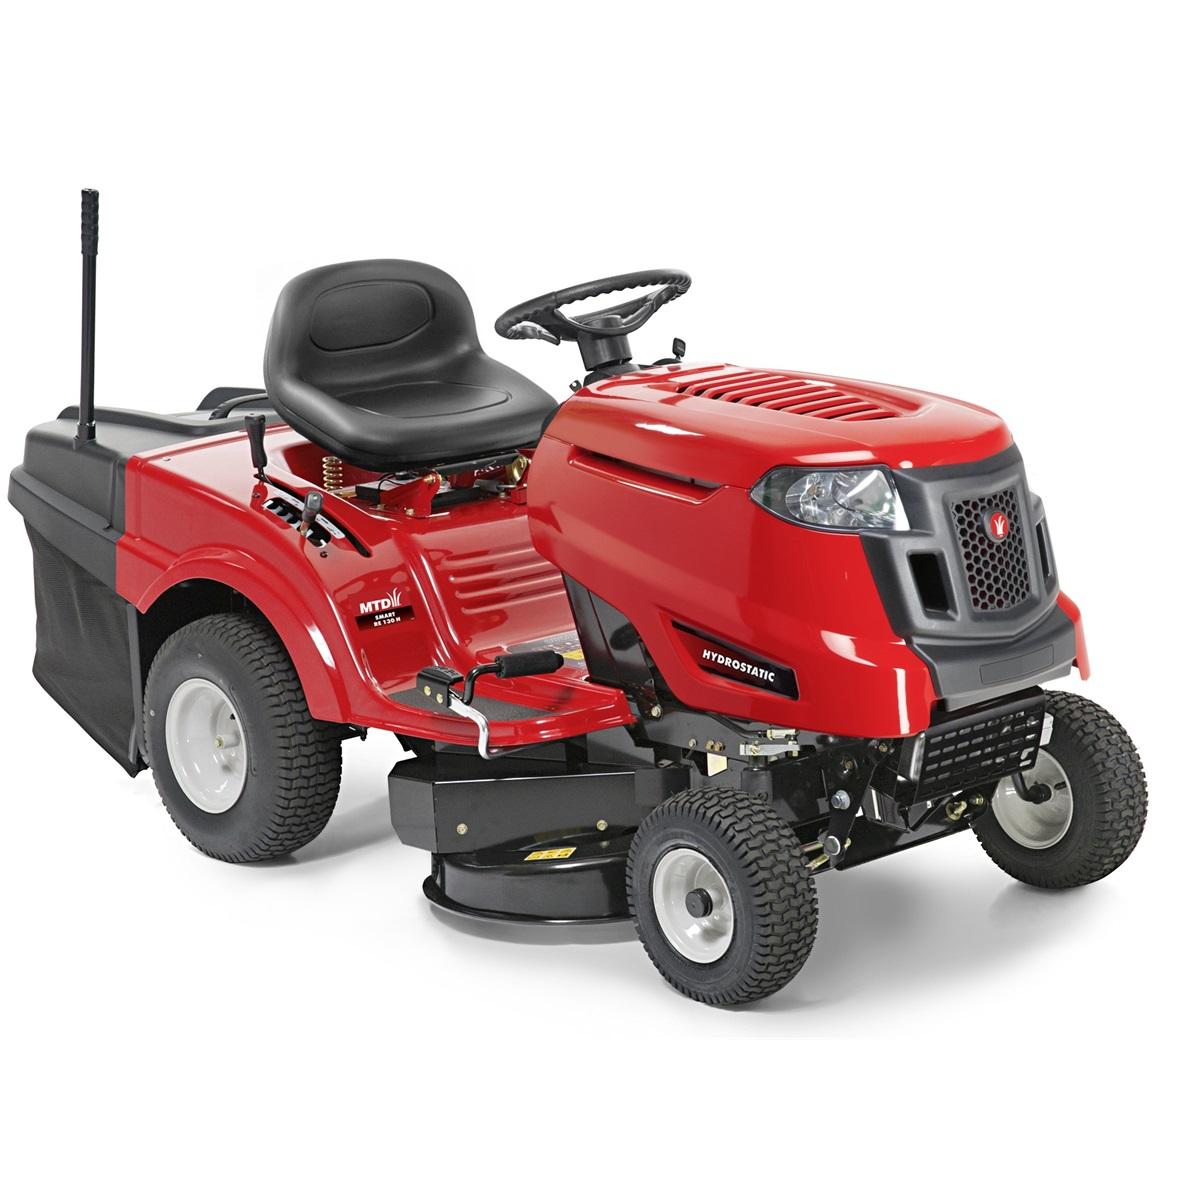 MTD SMART RE 130 H zahradní traktor + servis EXTRA